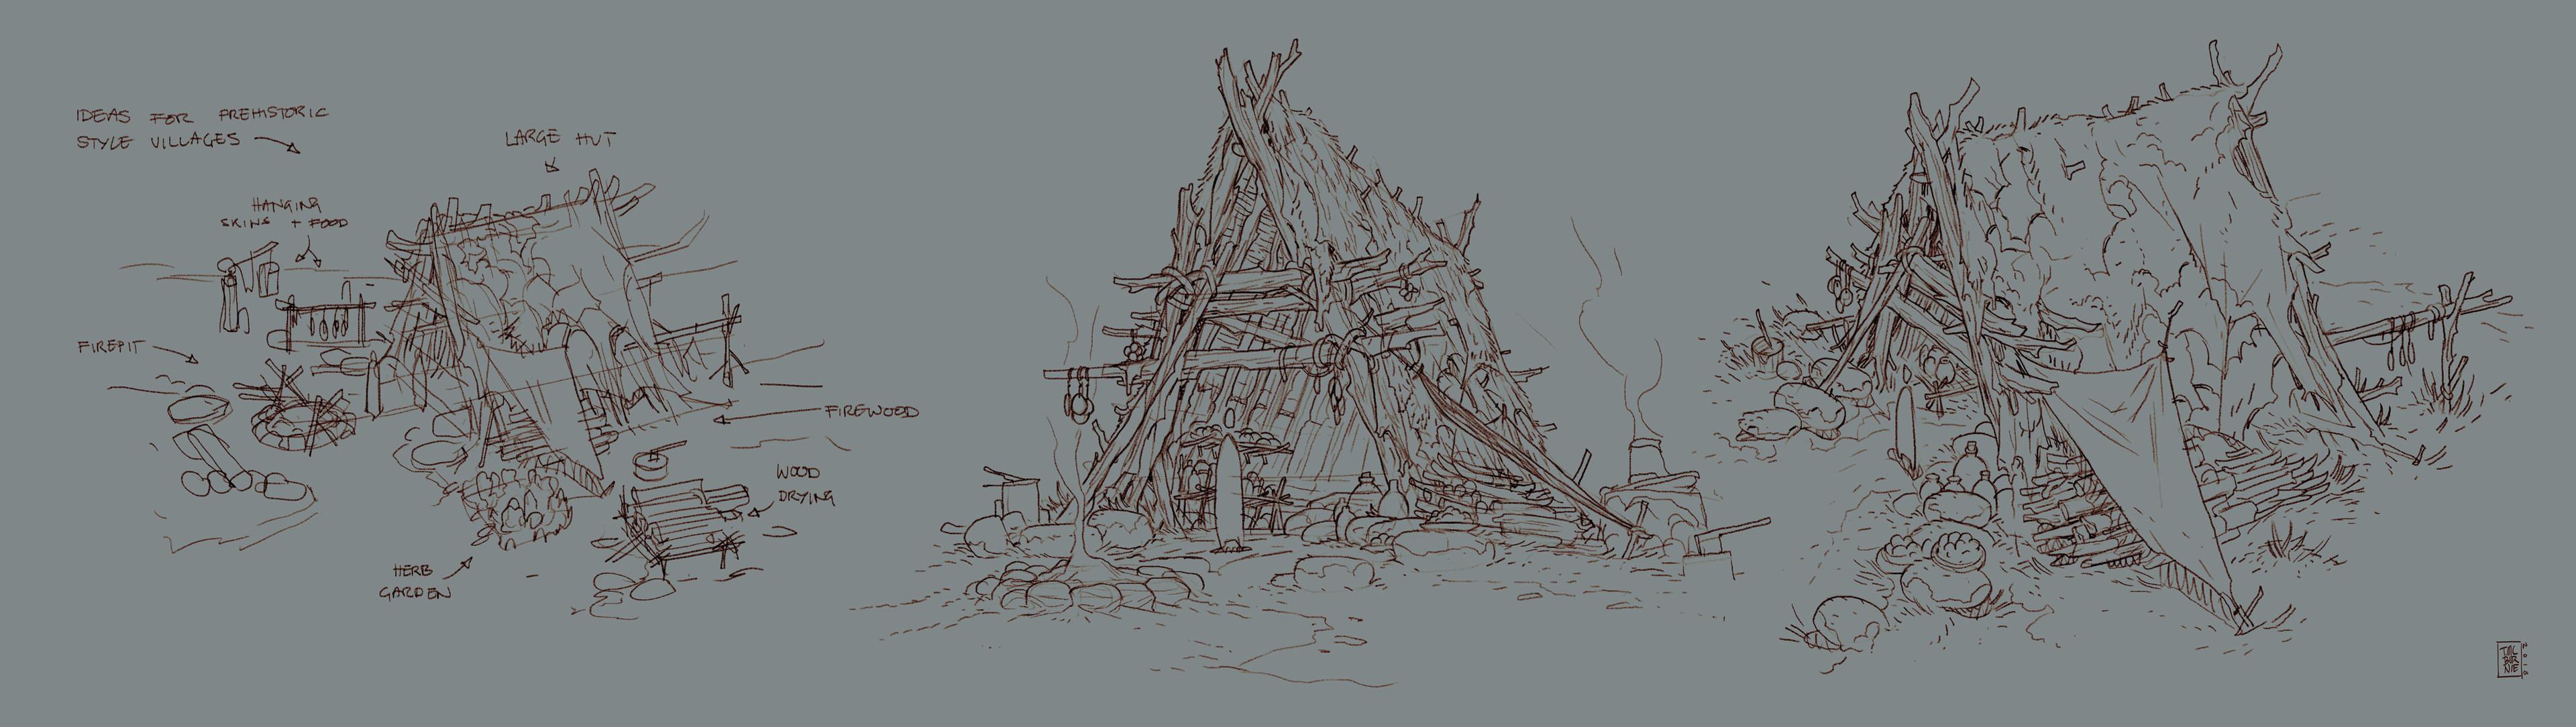 Hut Callout